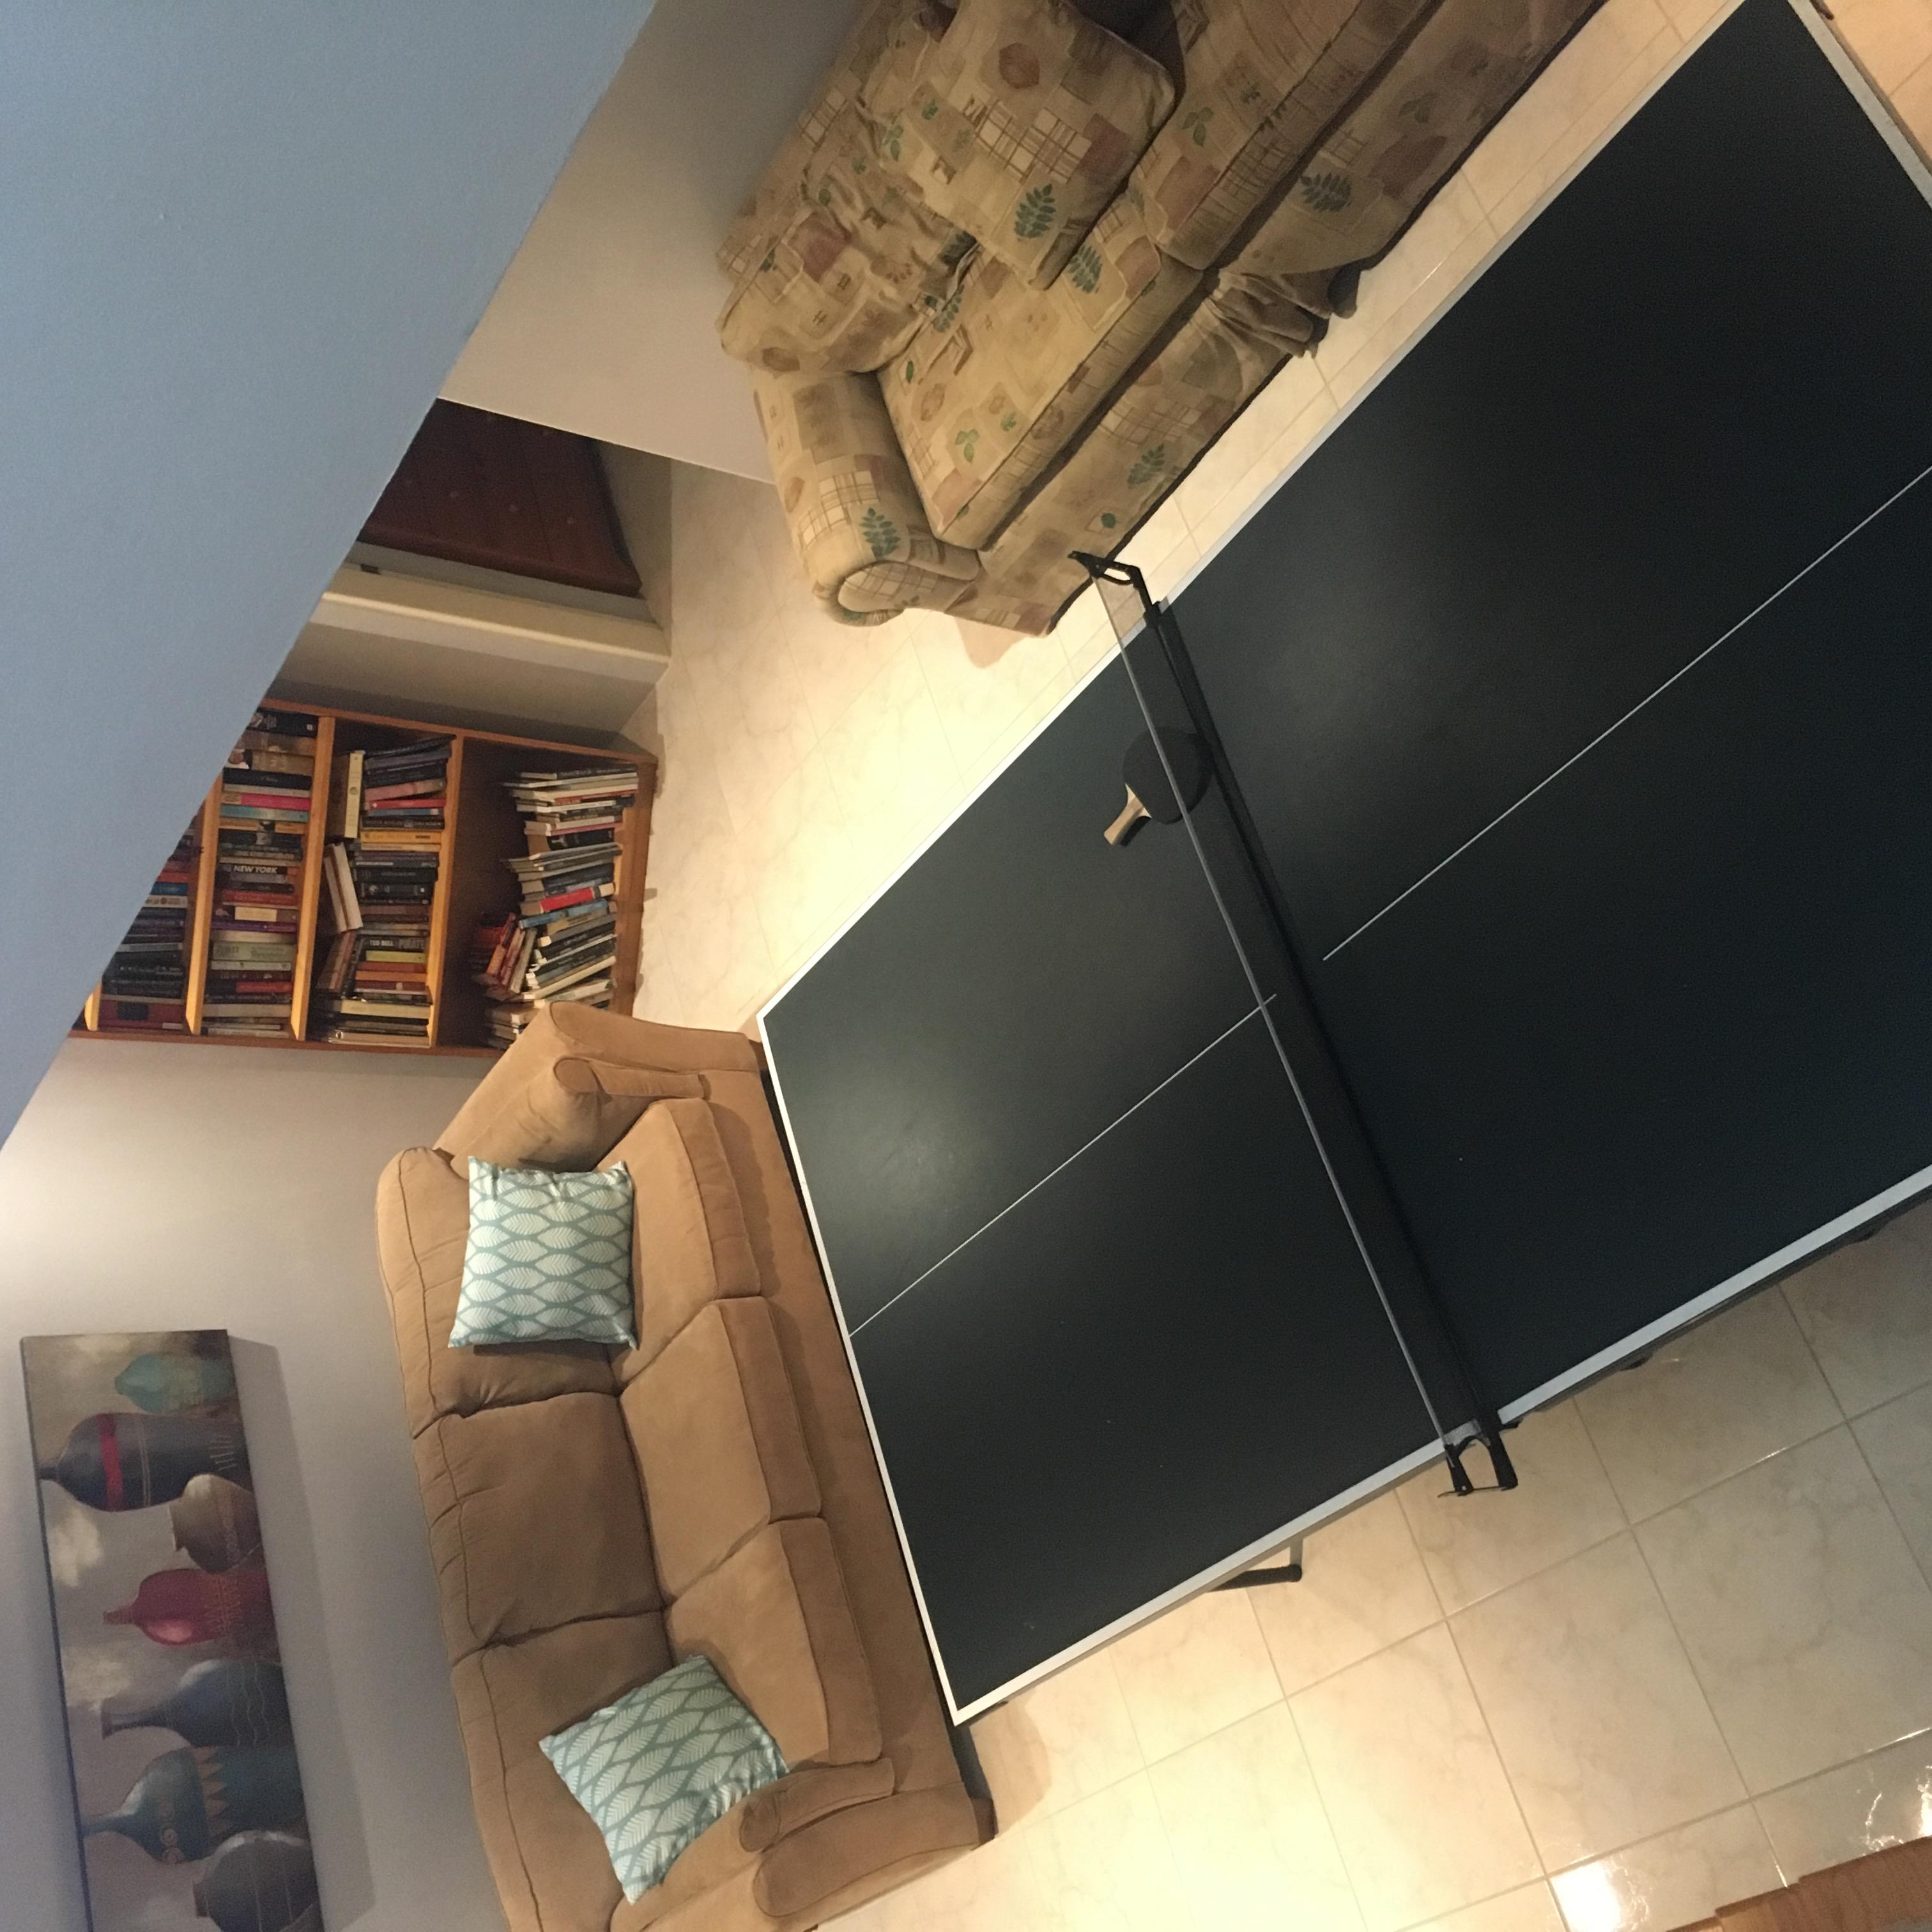 Airbnb Alternative Property in Holyoke